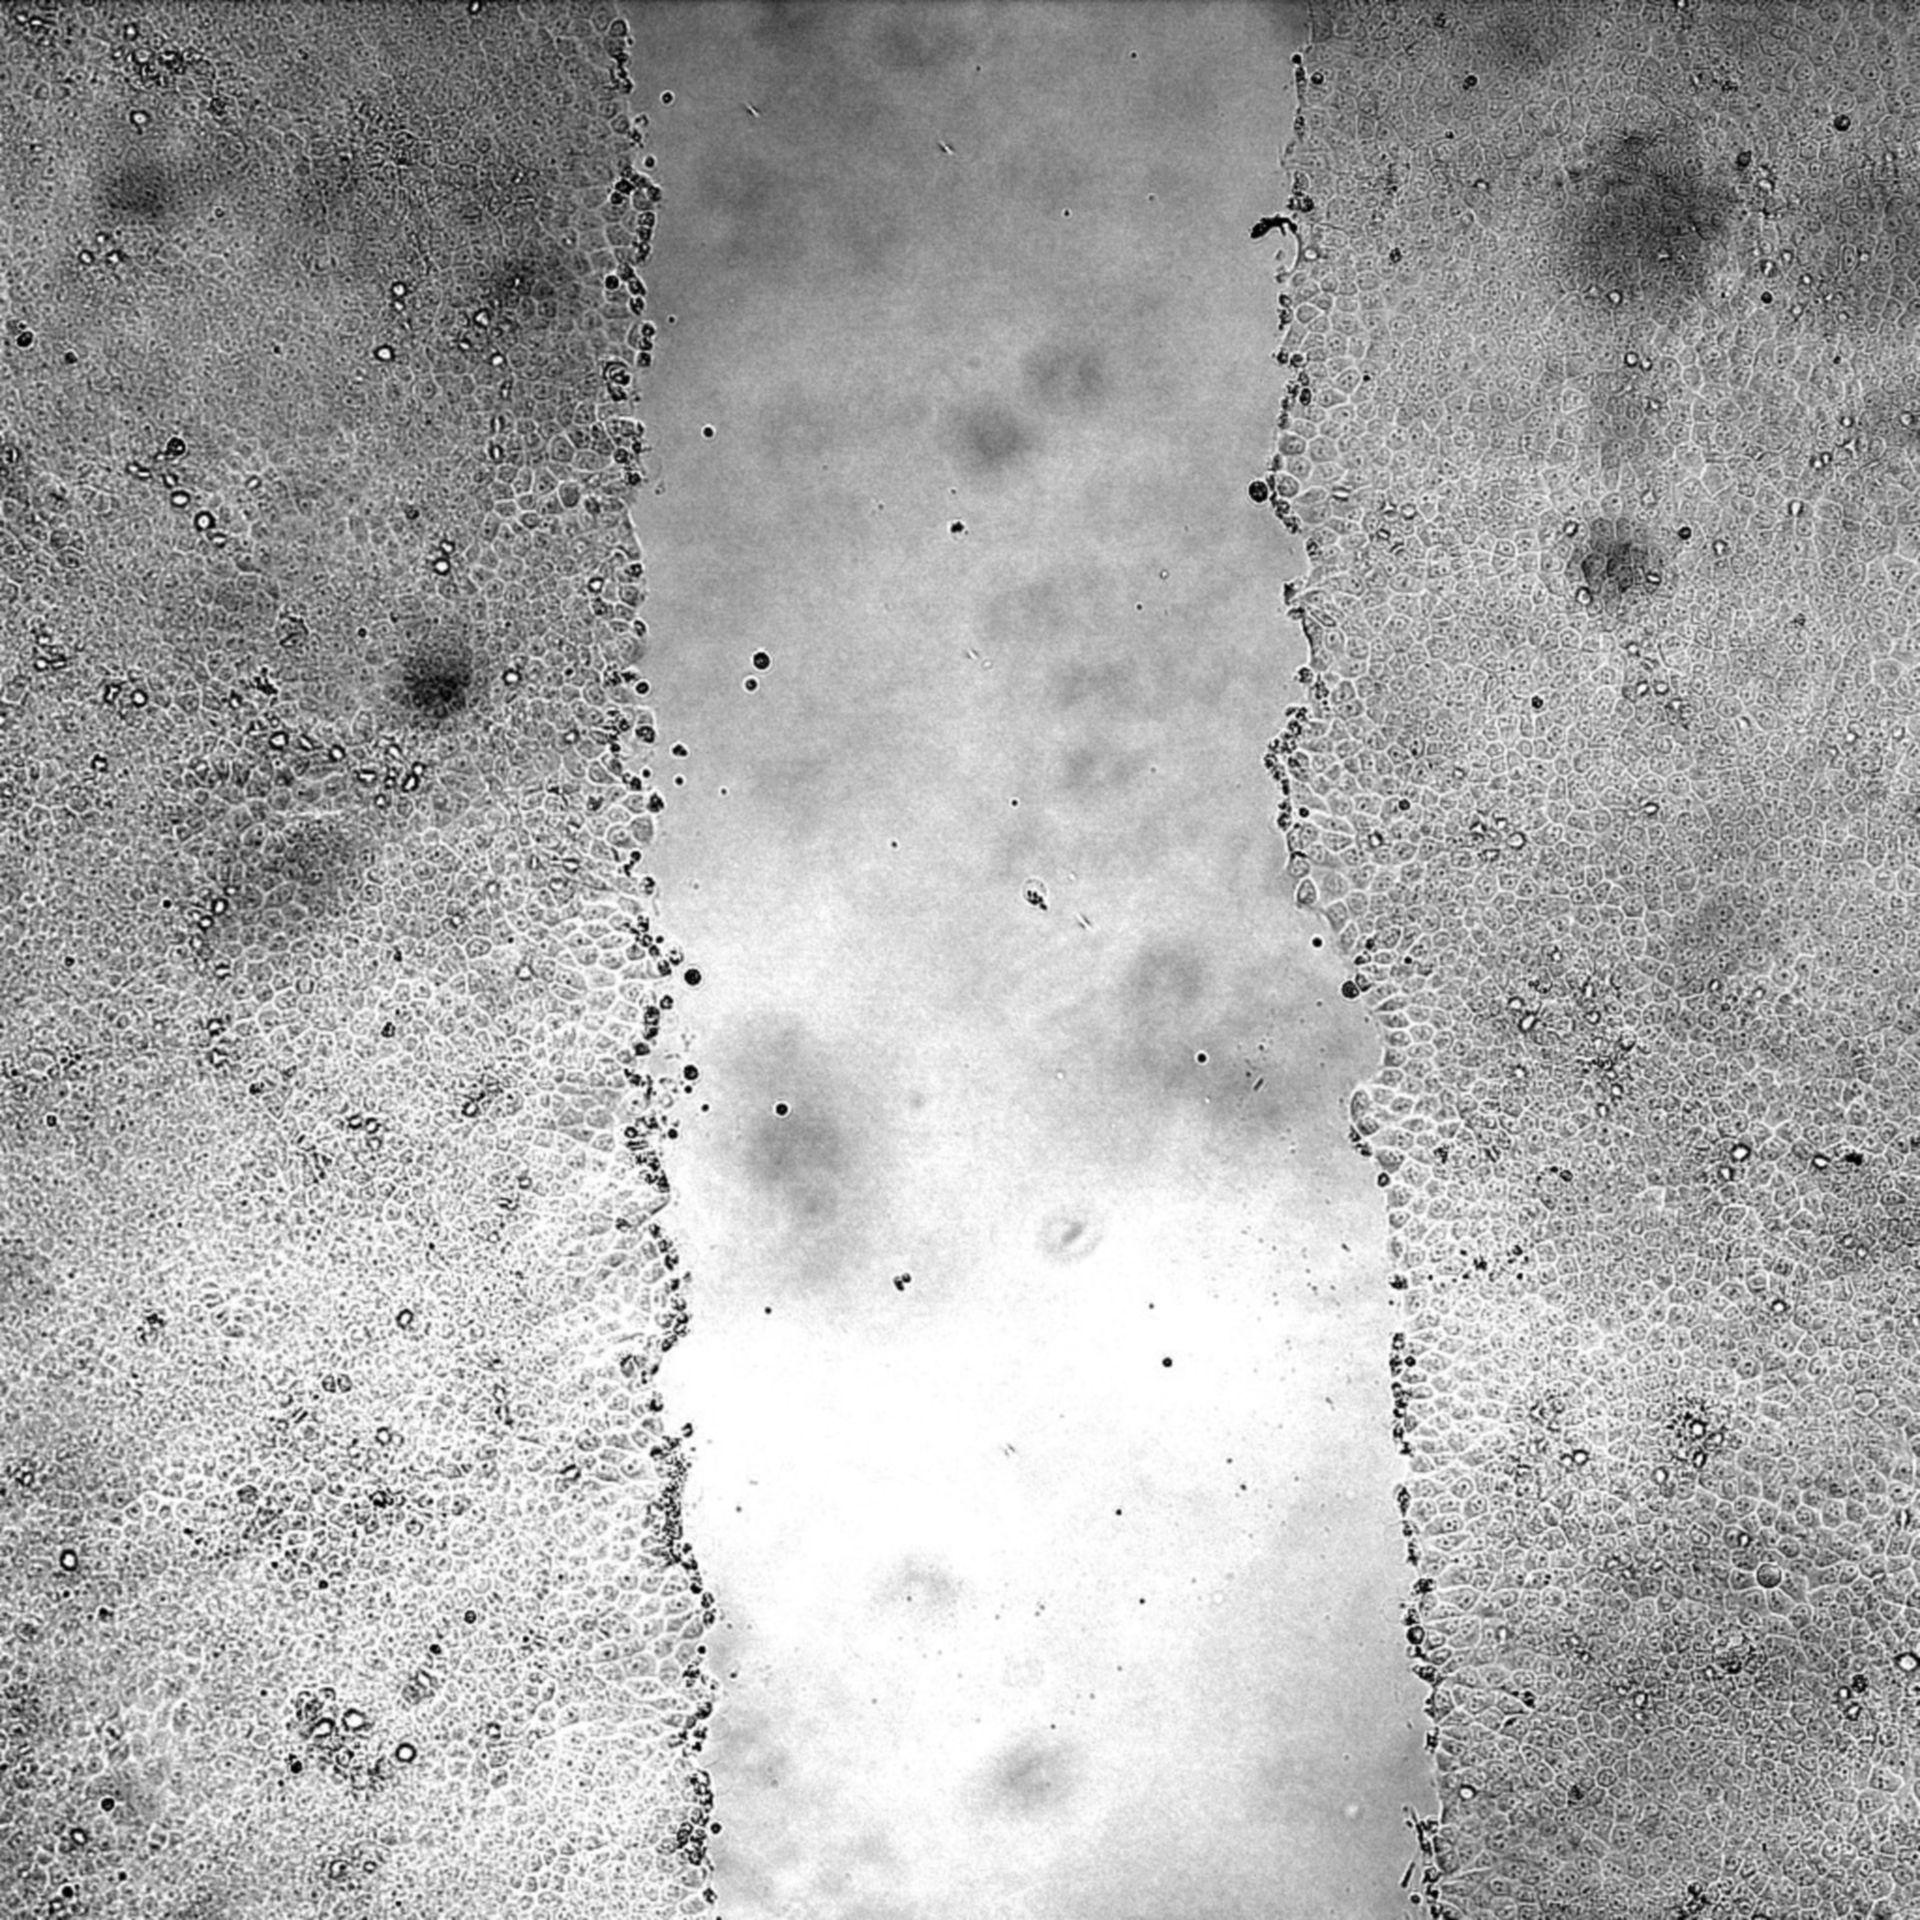 Canis lupus familiaris (Kidney cellule epiteliali) - CIL: 44509